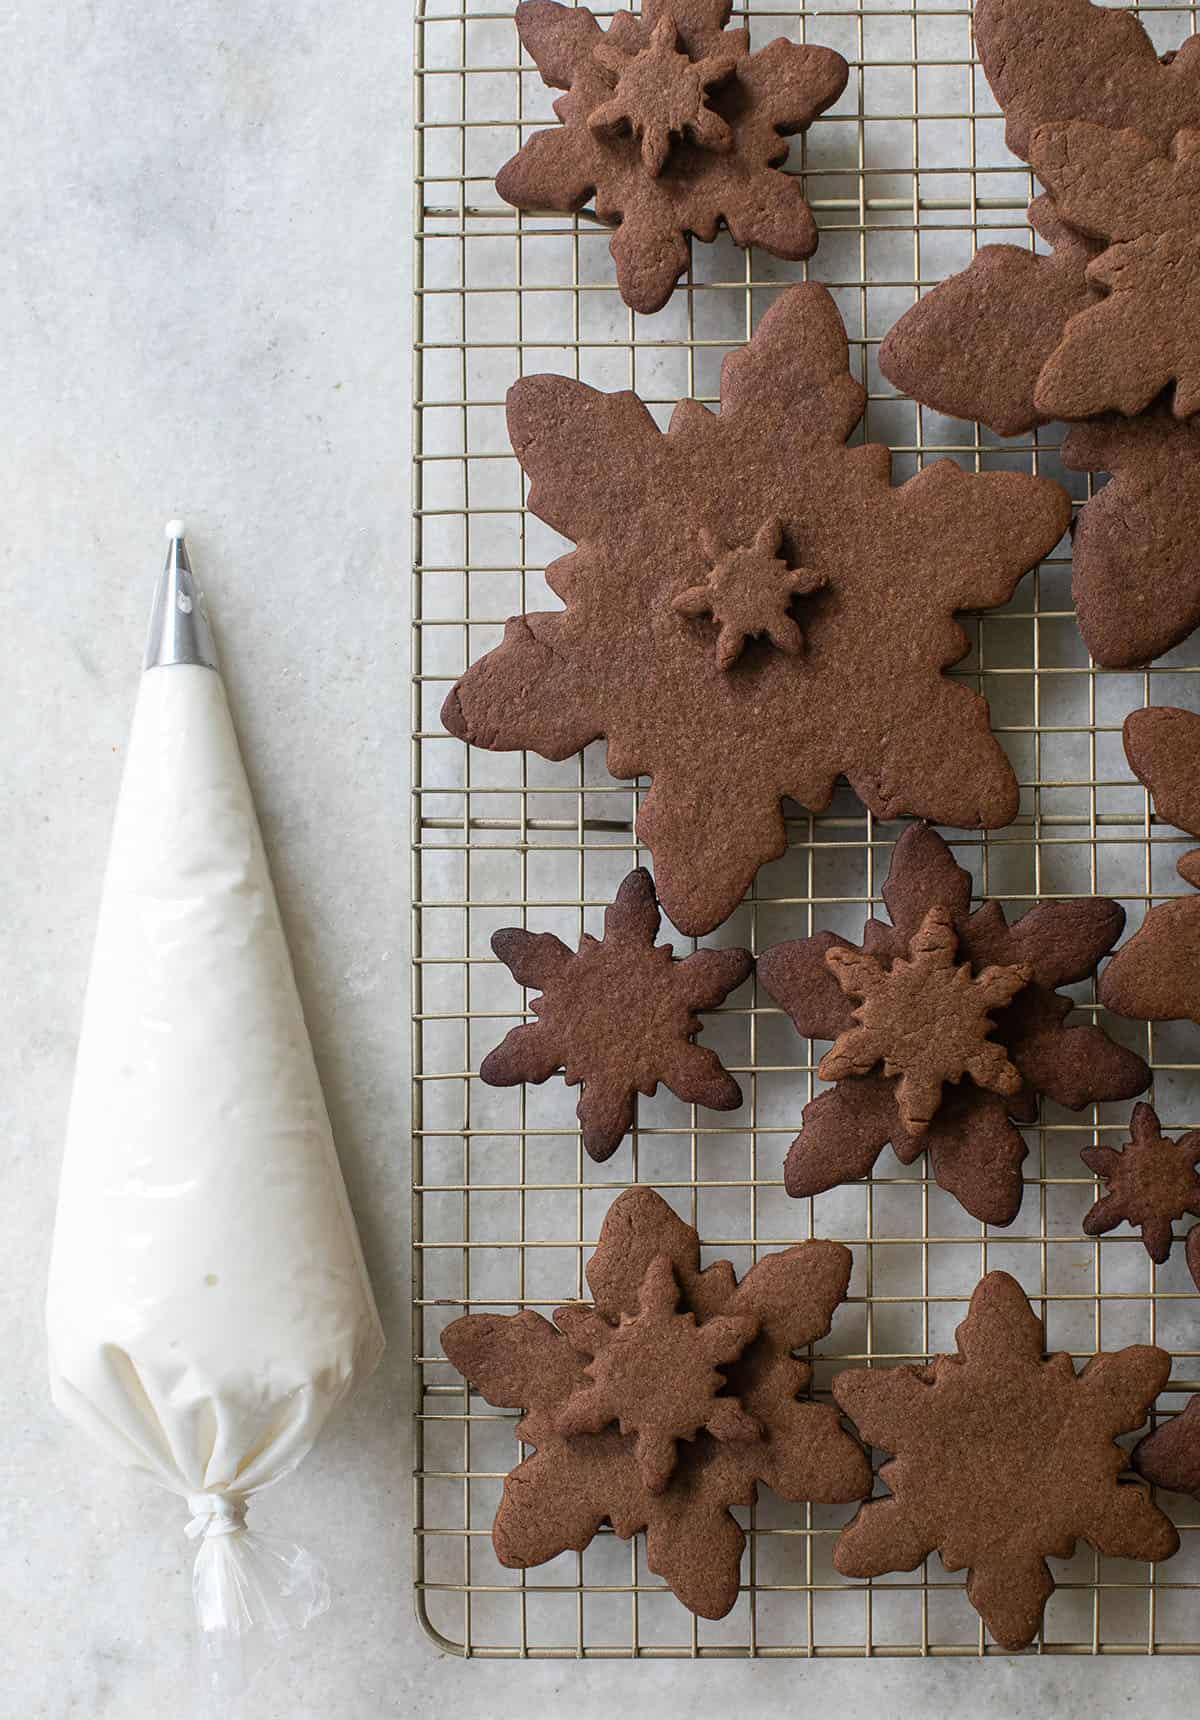 gingerbread snowflake cutouts and icing